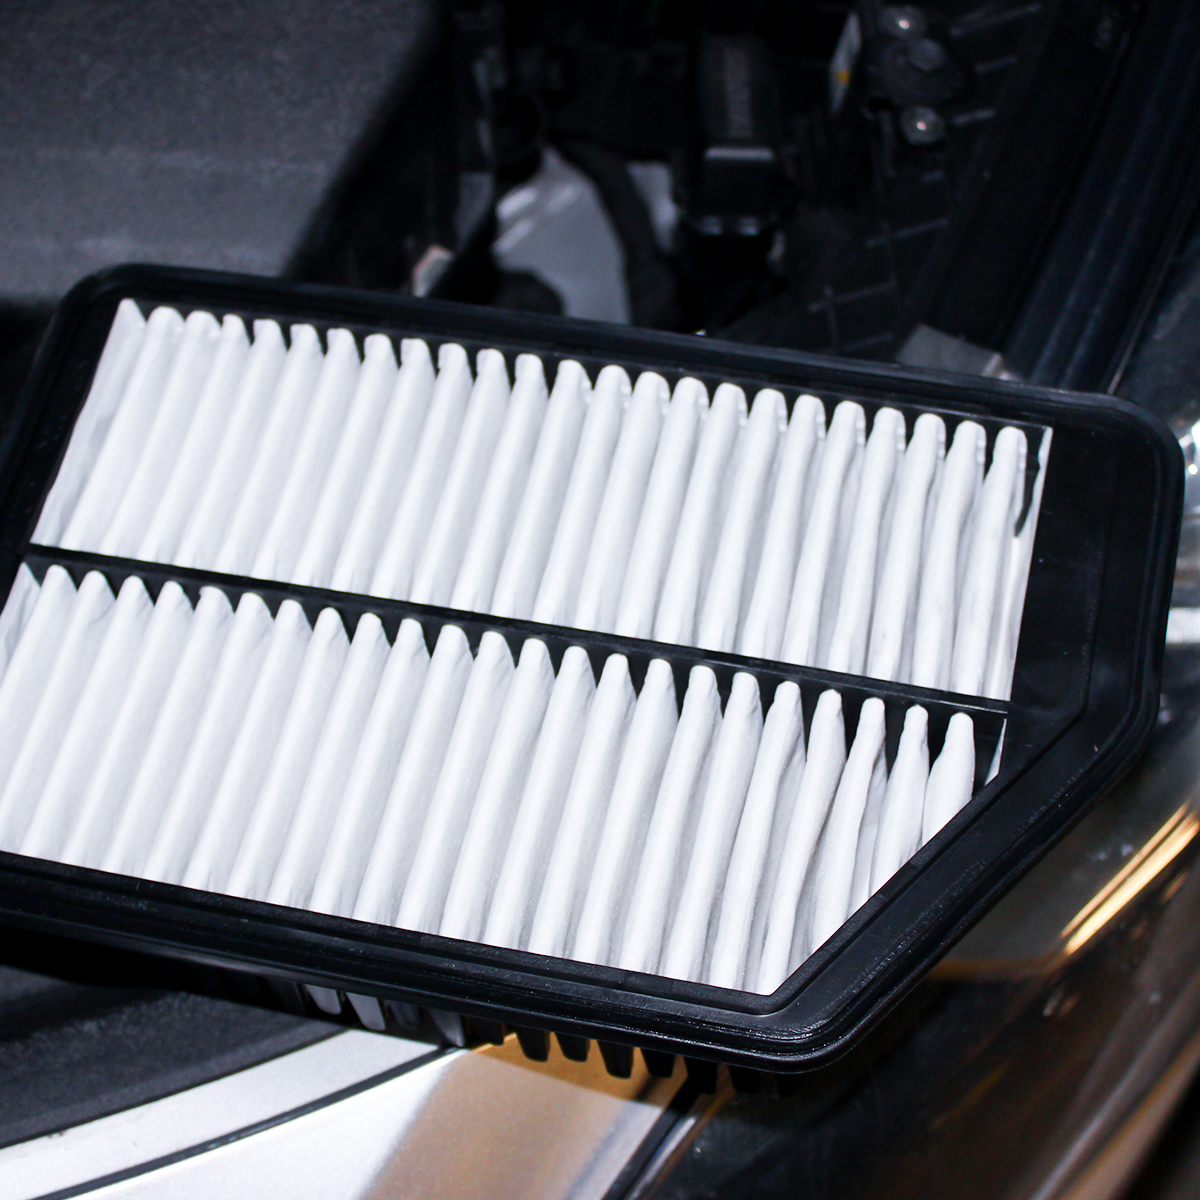 Air Filter Replacement Costs Services Autoguru Mercedes Benz Fuel